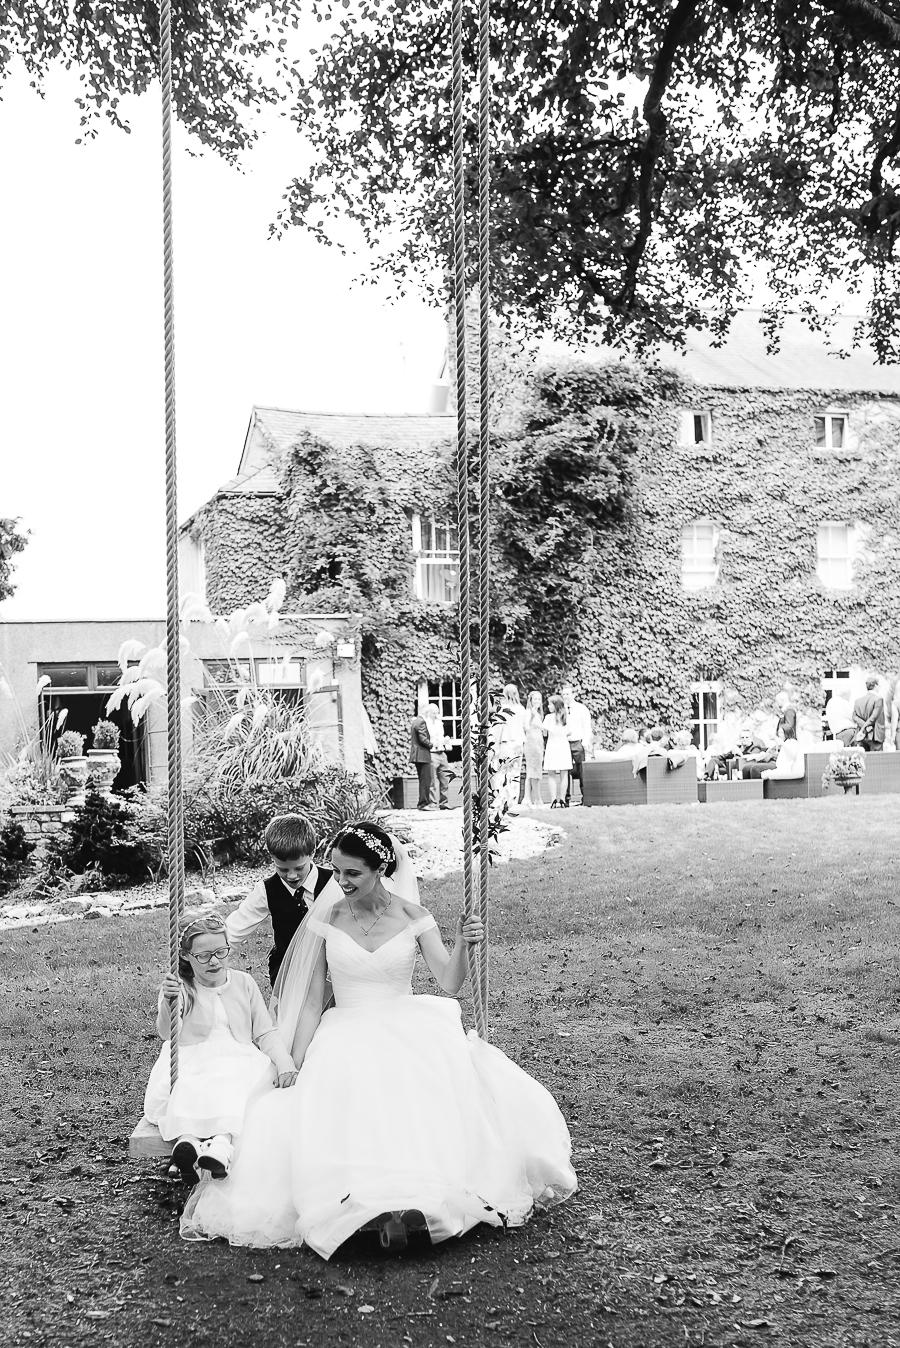 OurBeautifulAdventure-FairyhillWedding-John&Zoe-WeddingBlog-2-8.jpg